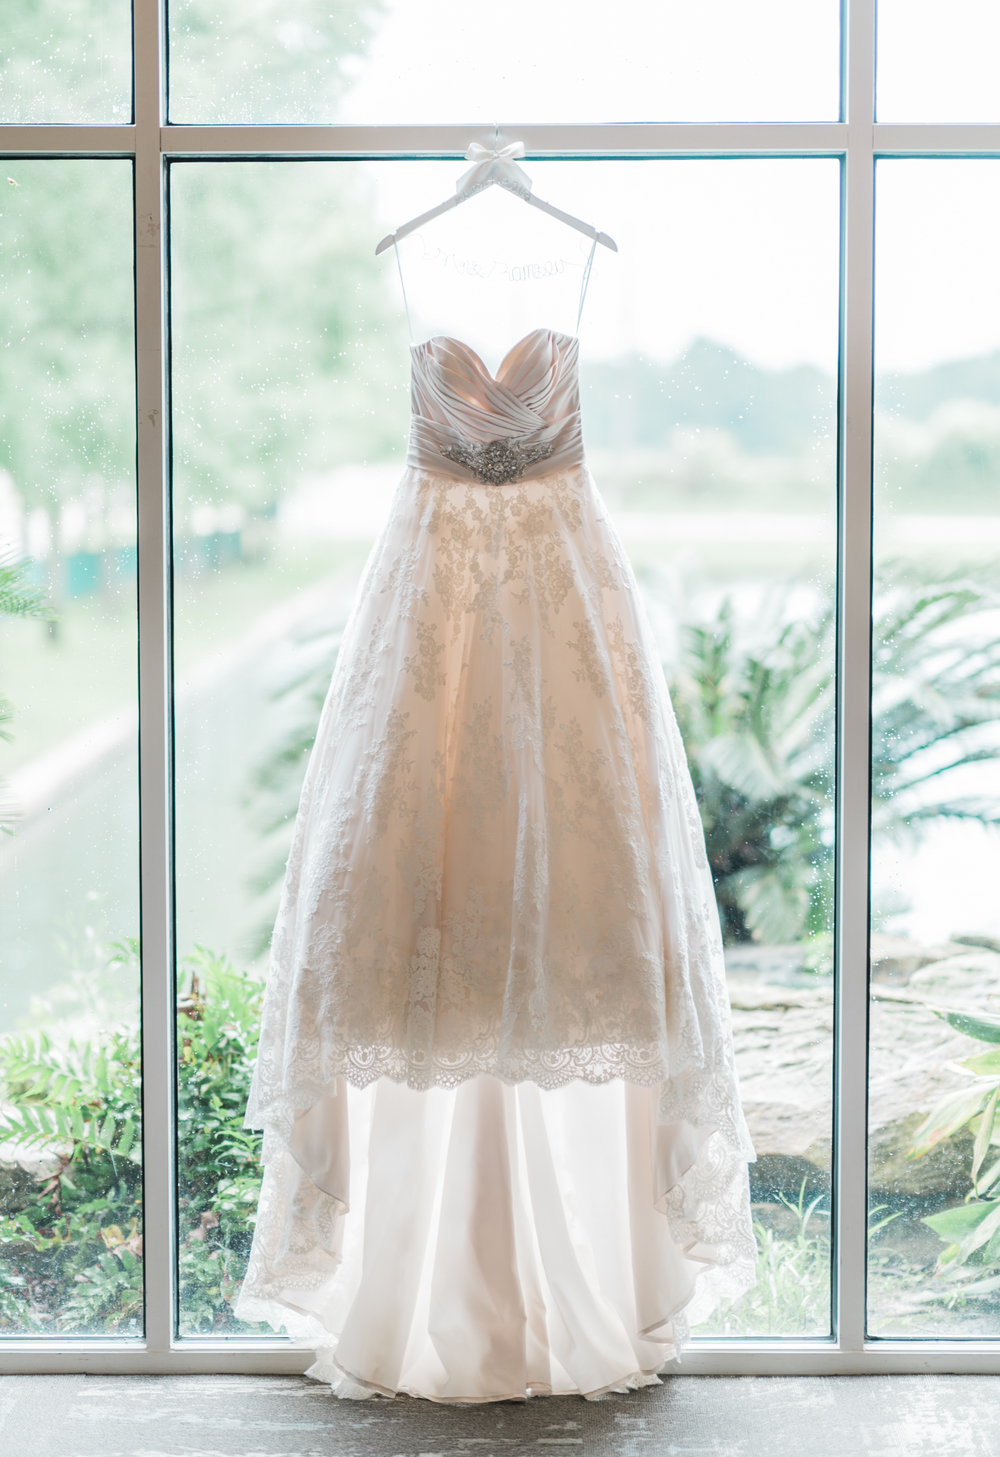 06-04-16_Ramsey_dress-4.jpg